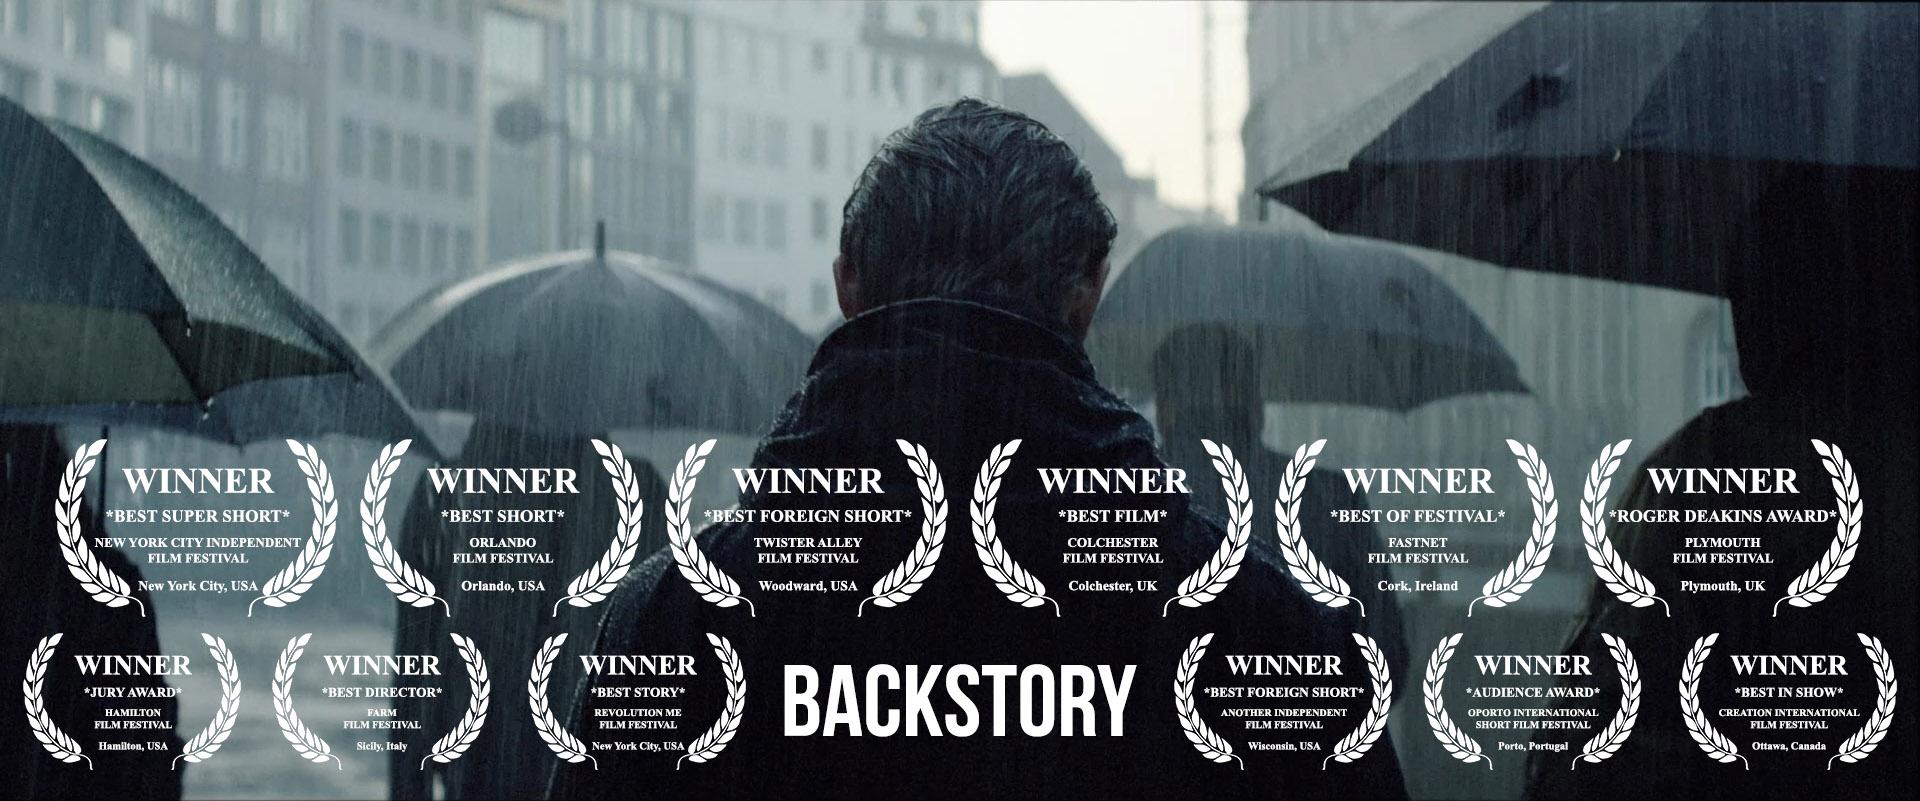 Best Director Short - Joschka Laukeninks BACKSTORY (dir. J. Laukeninks)